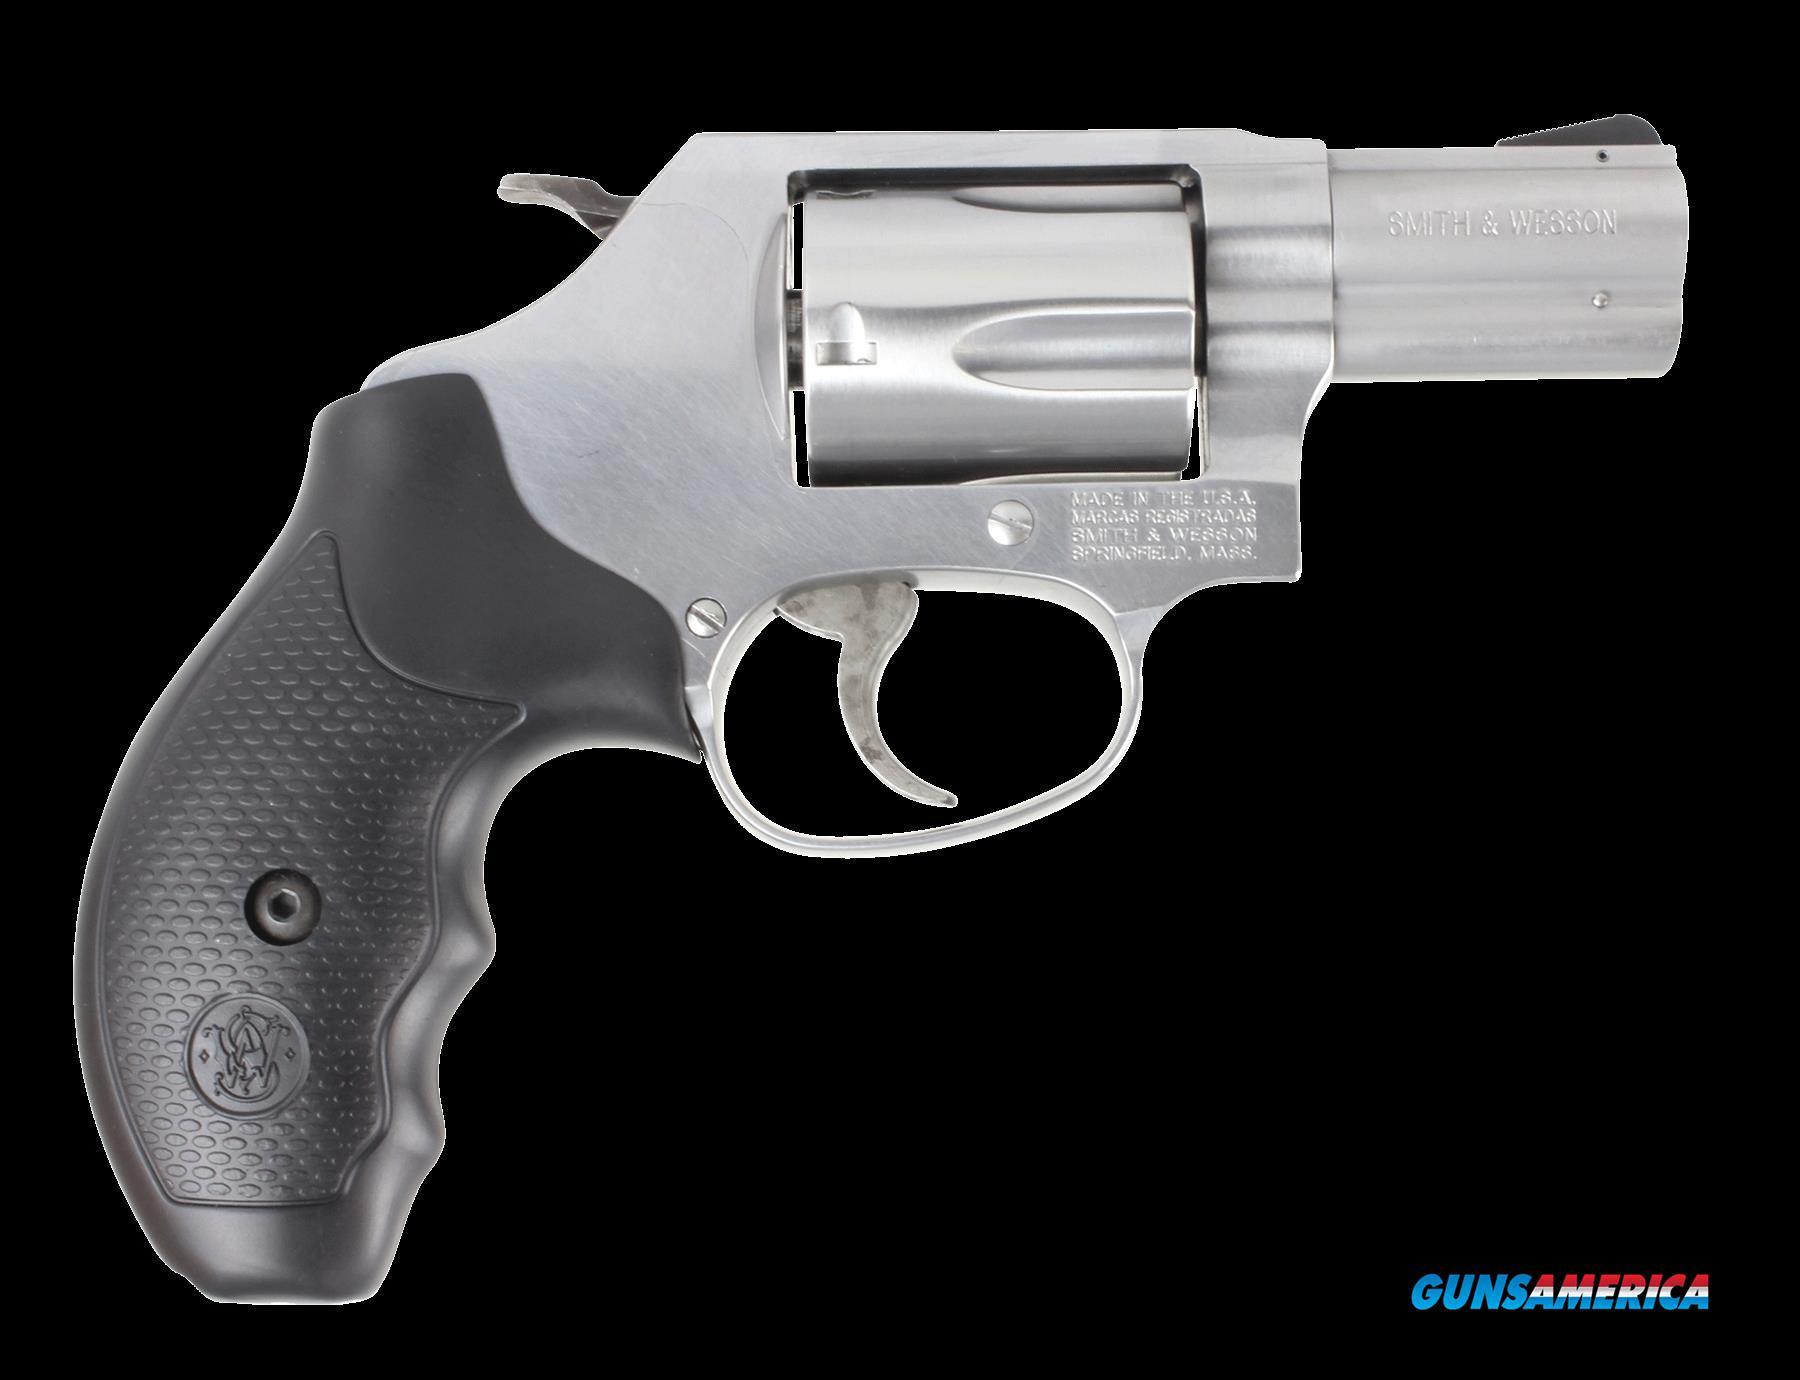 Smith & Wesson 60, S&w M60       162420 357  2             Ss  Guns > Pistols > 1911 Pistol Copies (non-Colt)